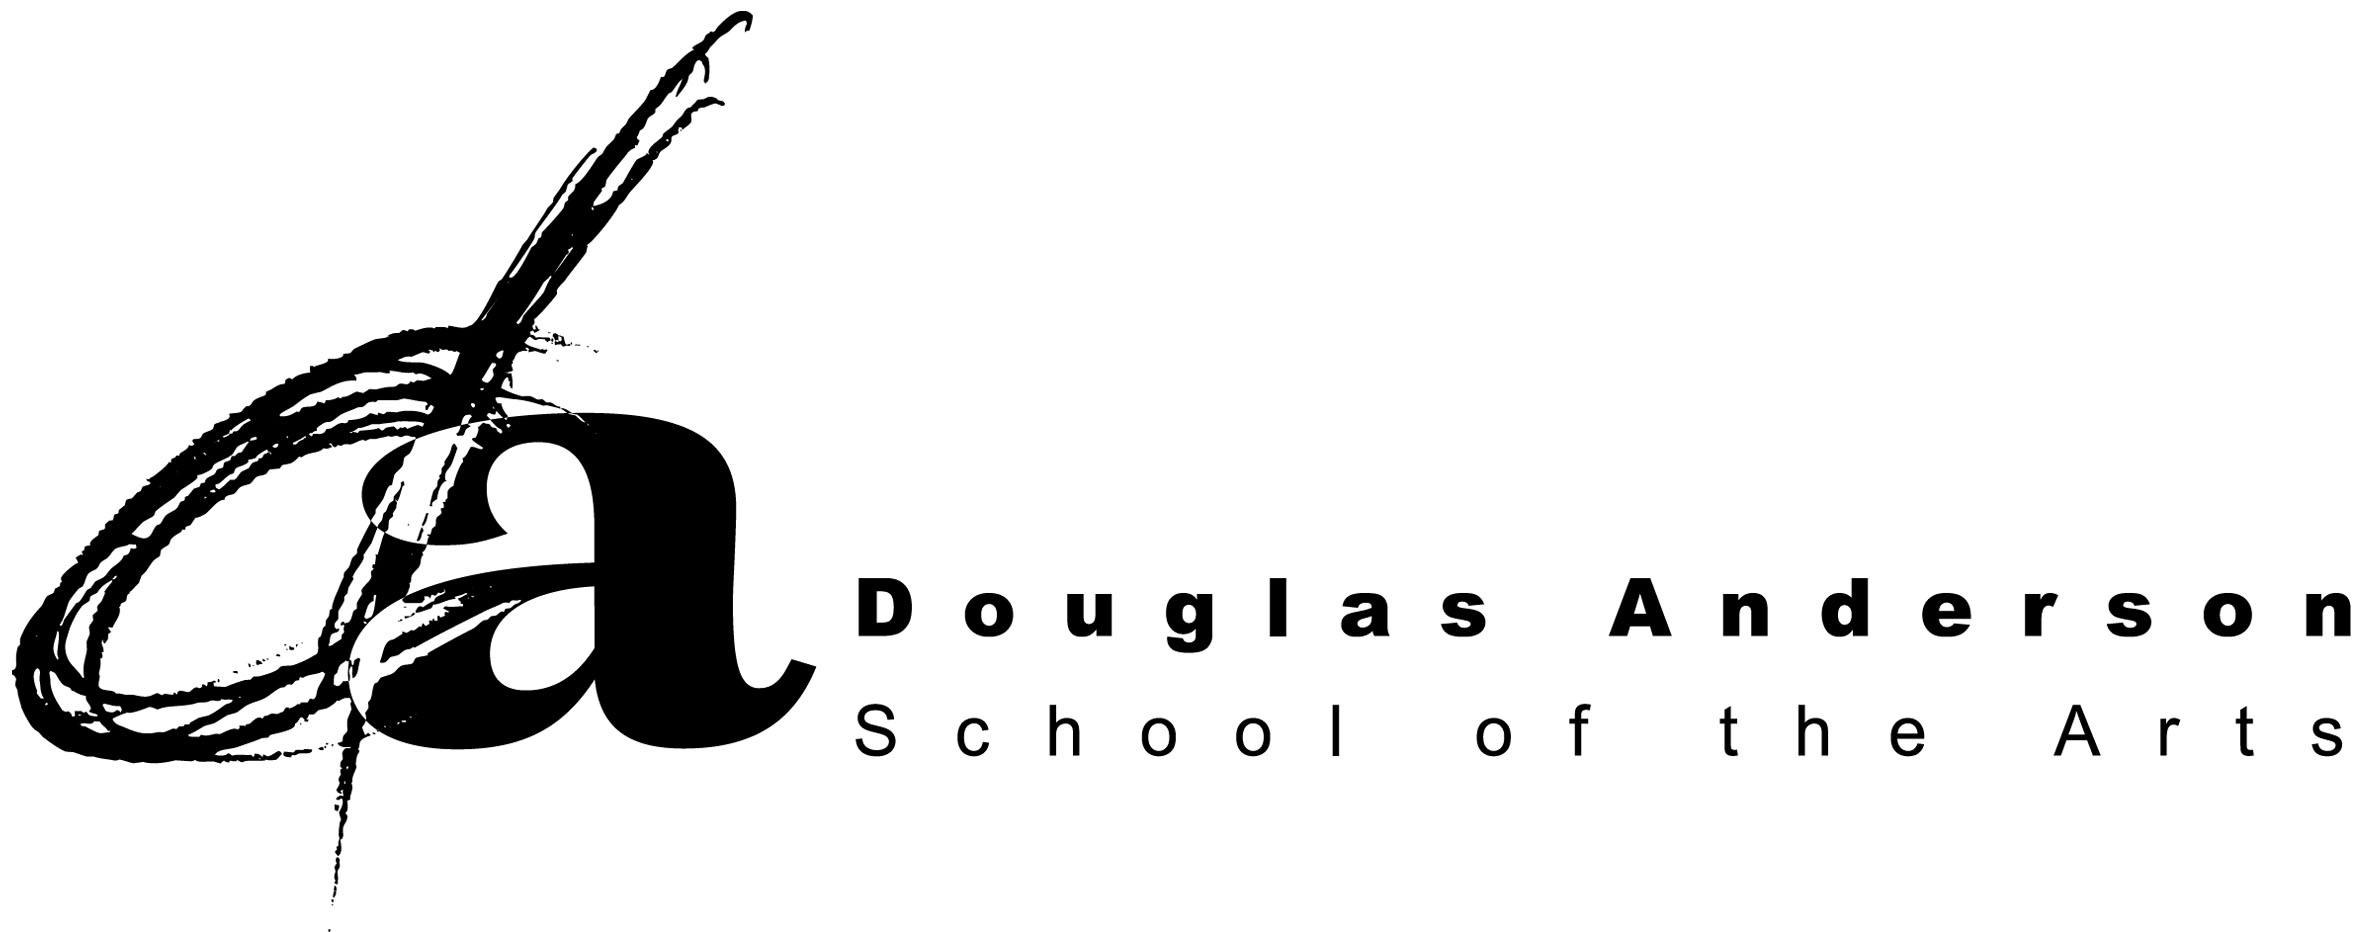 Cultural Connections: Douglas Anderson School of the Arts